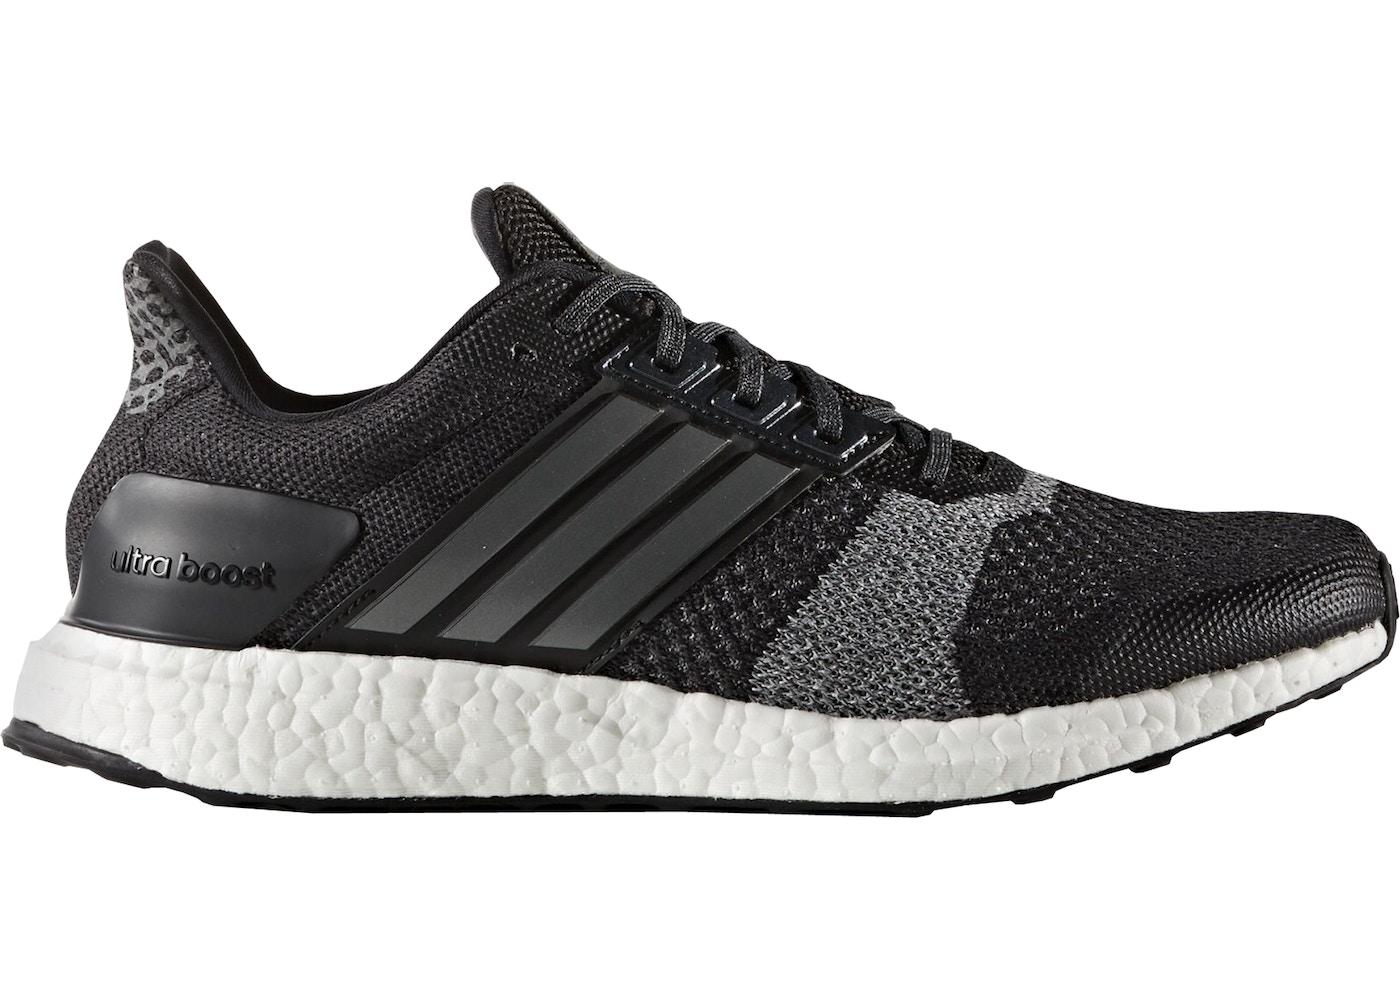 308e4d2b1bb adidas Ultra Boost ST Black Grey - BA7838